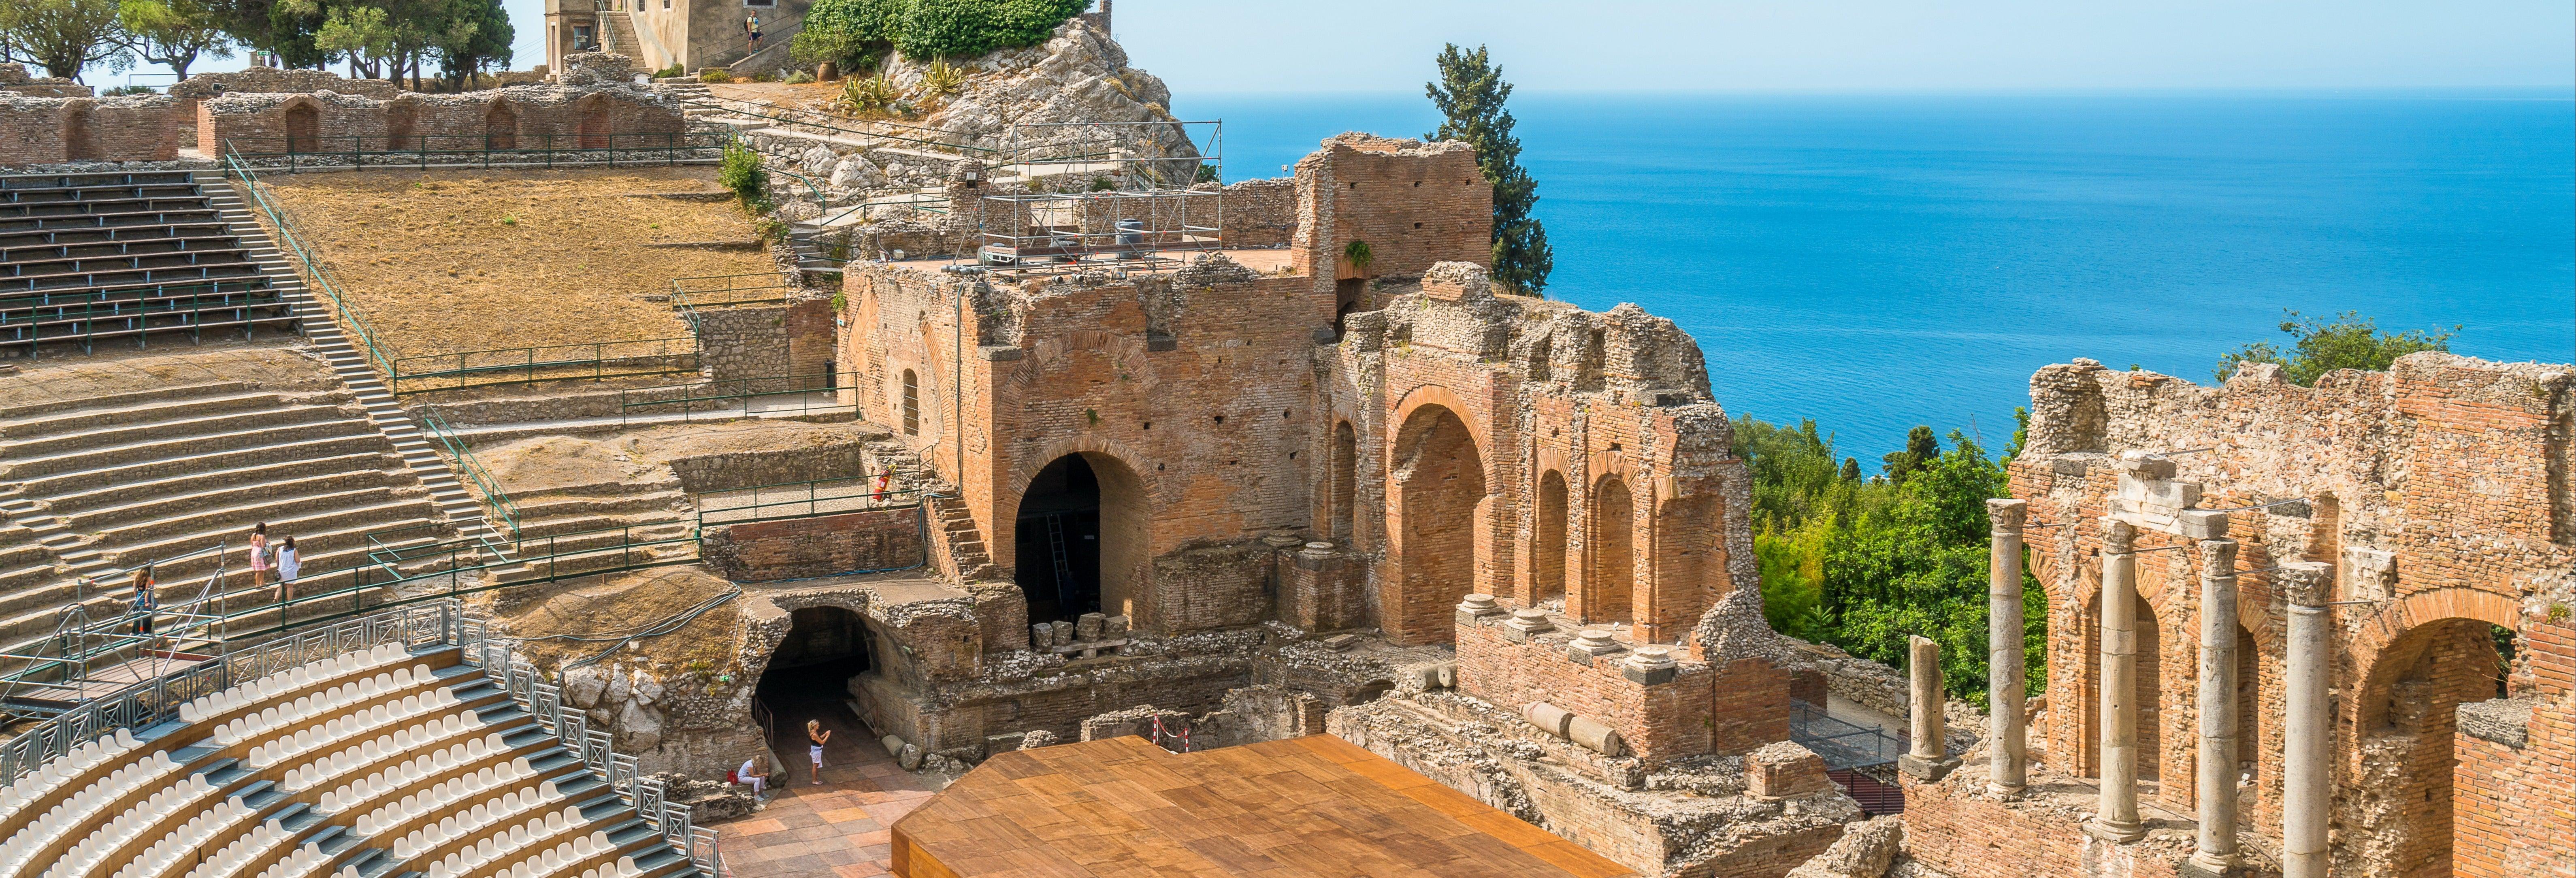 Tour por Taormina y Savoca